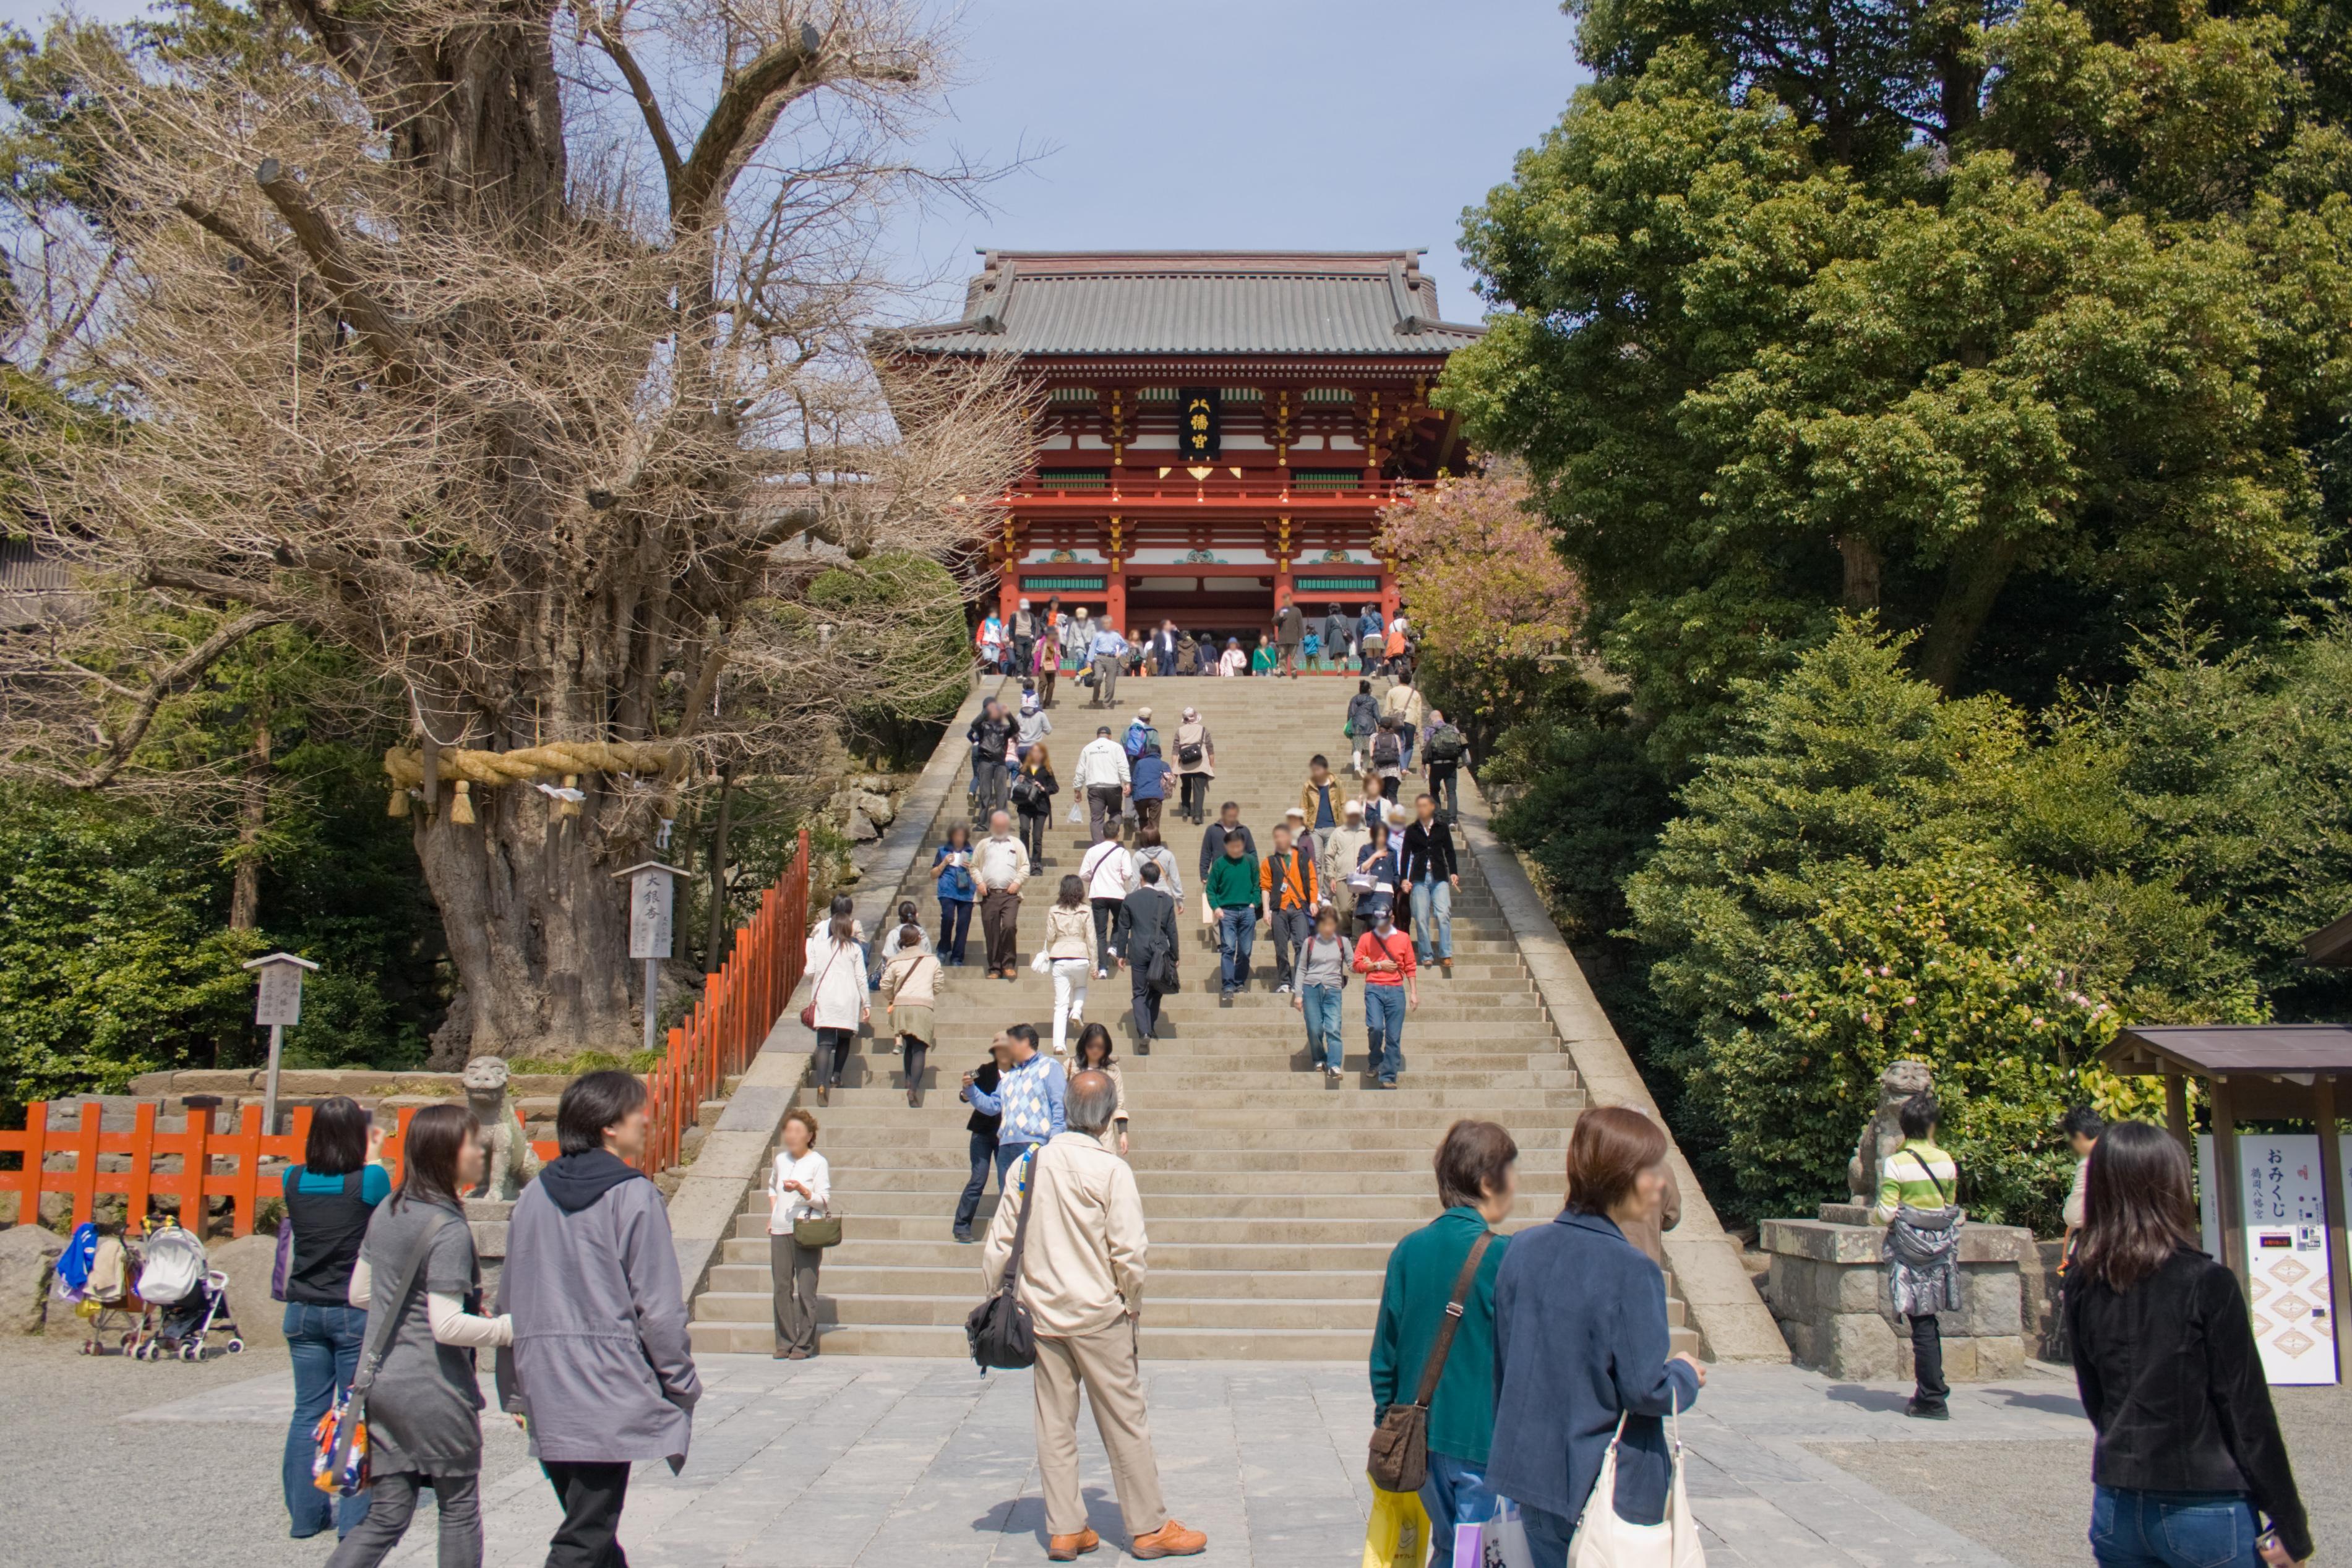 http://upload.wikimedia.org/wikipedia/commons/5/5d/Tsurugaoka_Hachiman-Shrine_05.jpg